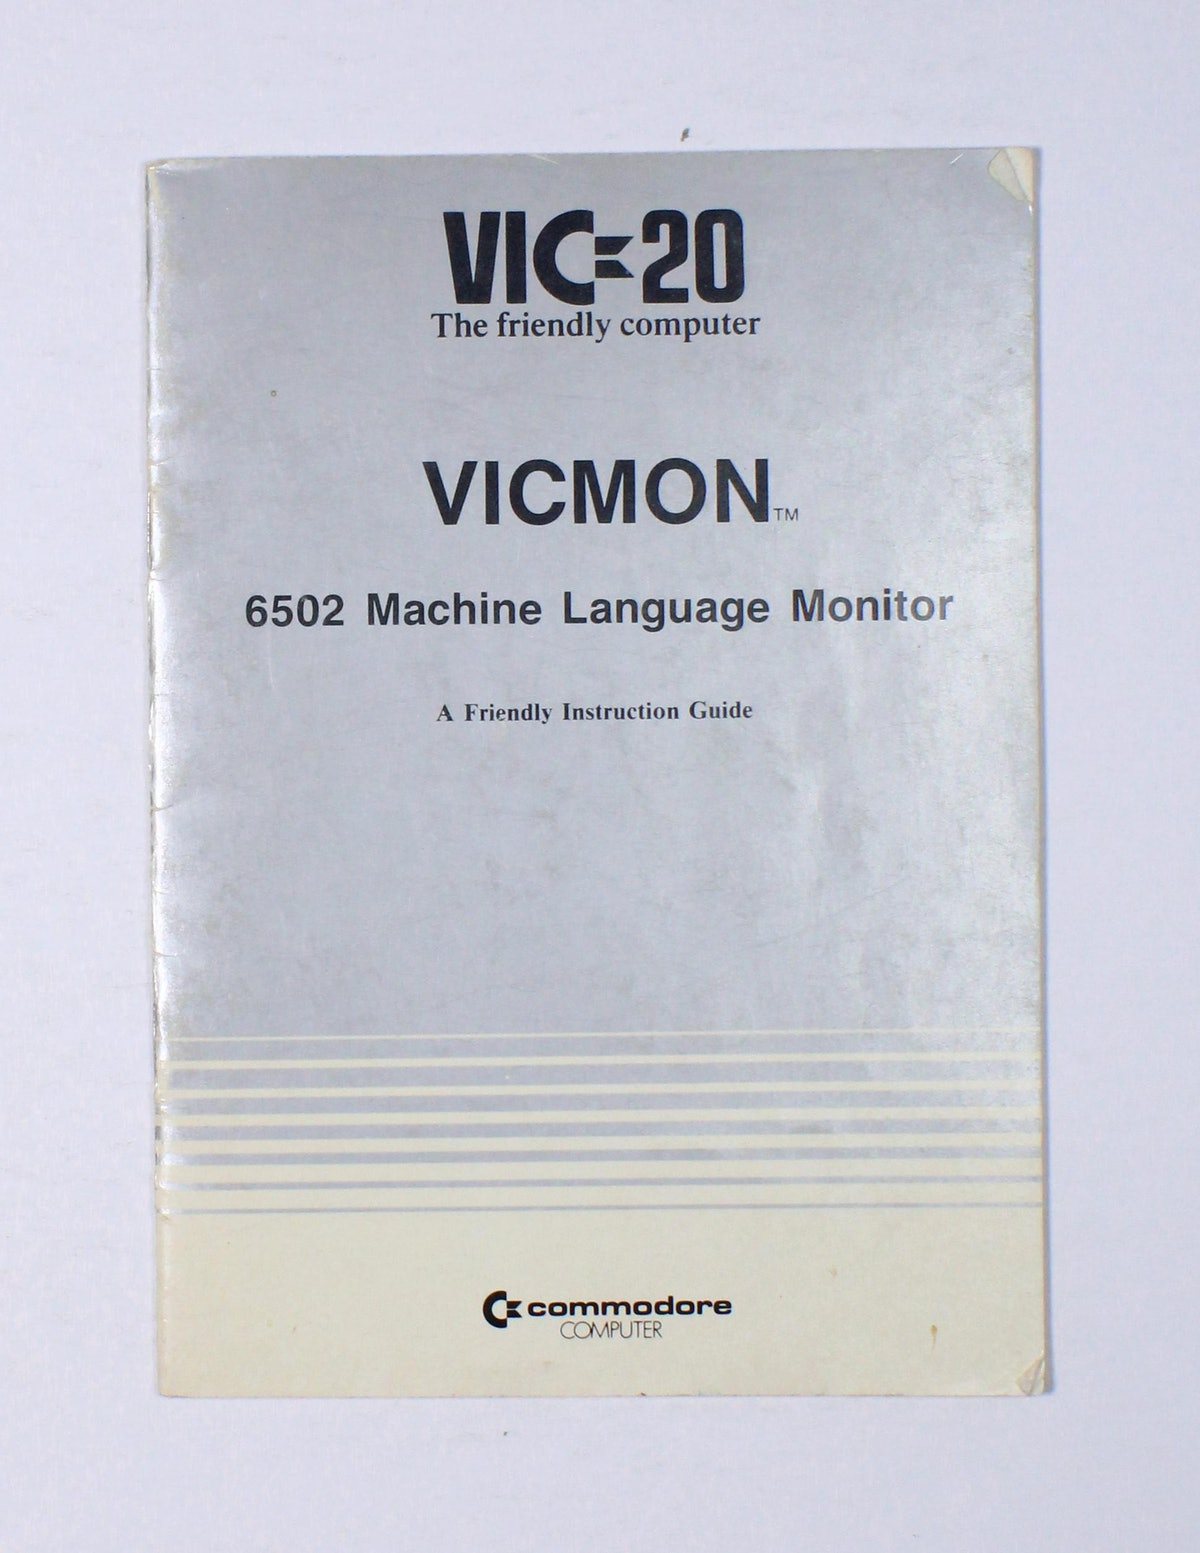 VICMON 6502 Machine Language Monitor: A friendly instruction guide